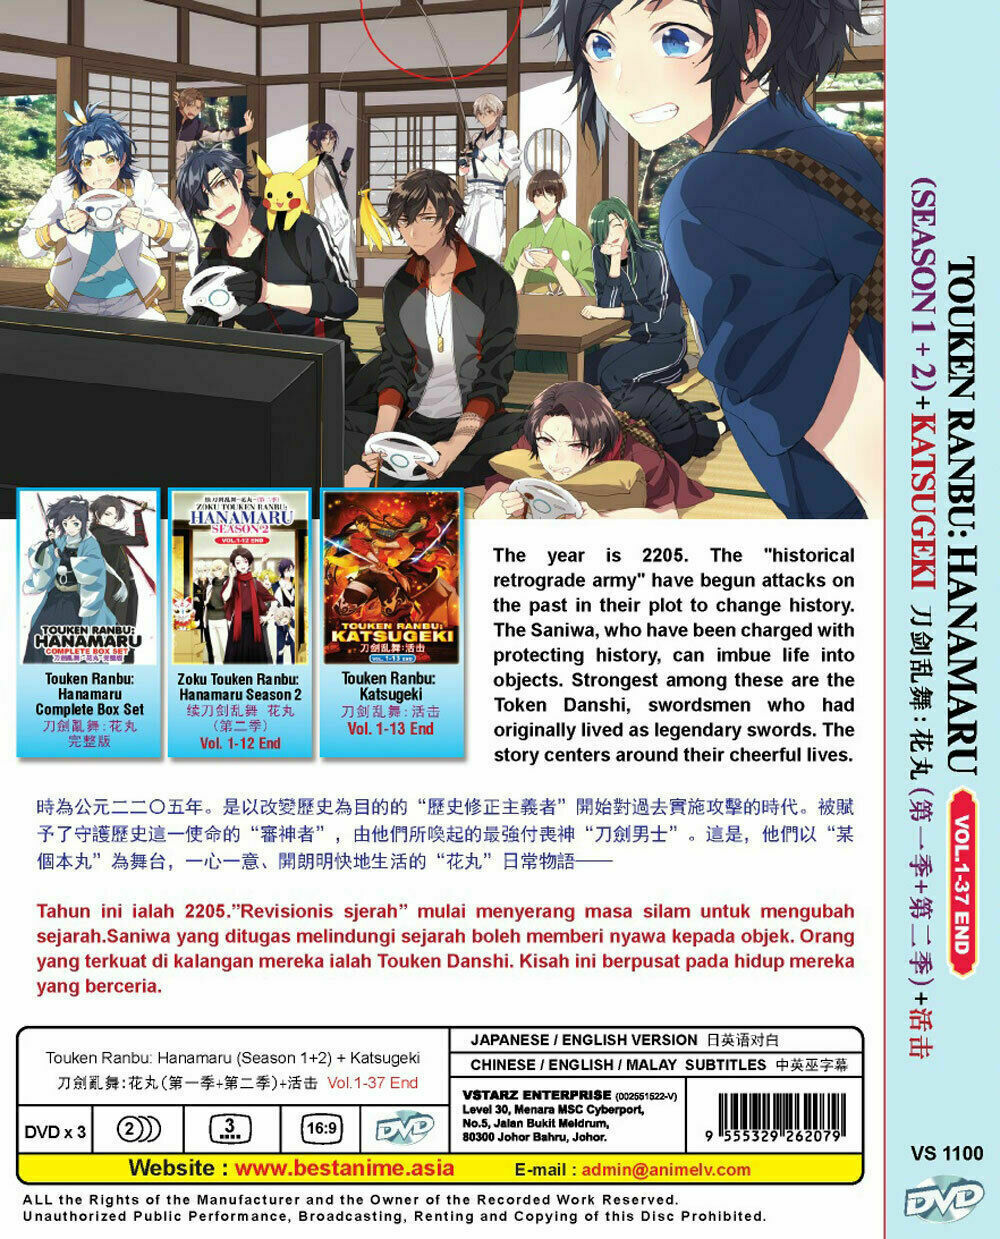 Touken Ranbu:Hanamaru Sea 1-2 + Katsugeki Vol.1-37End ANIME DVD ENGLISH DUB USA